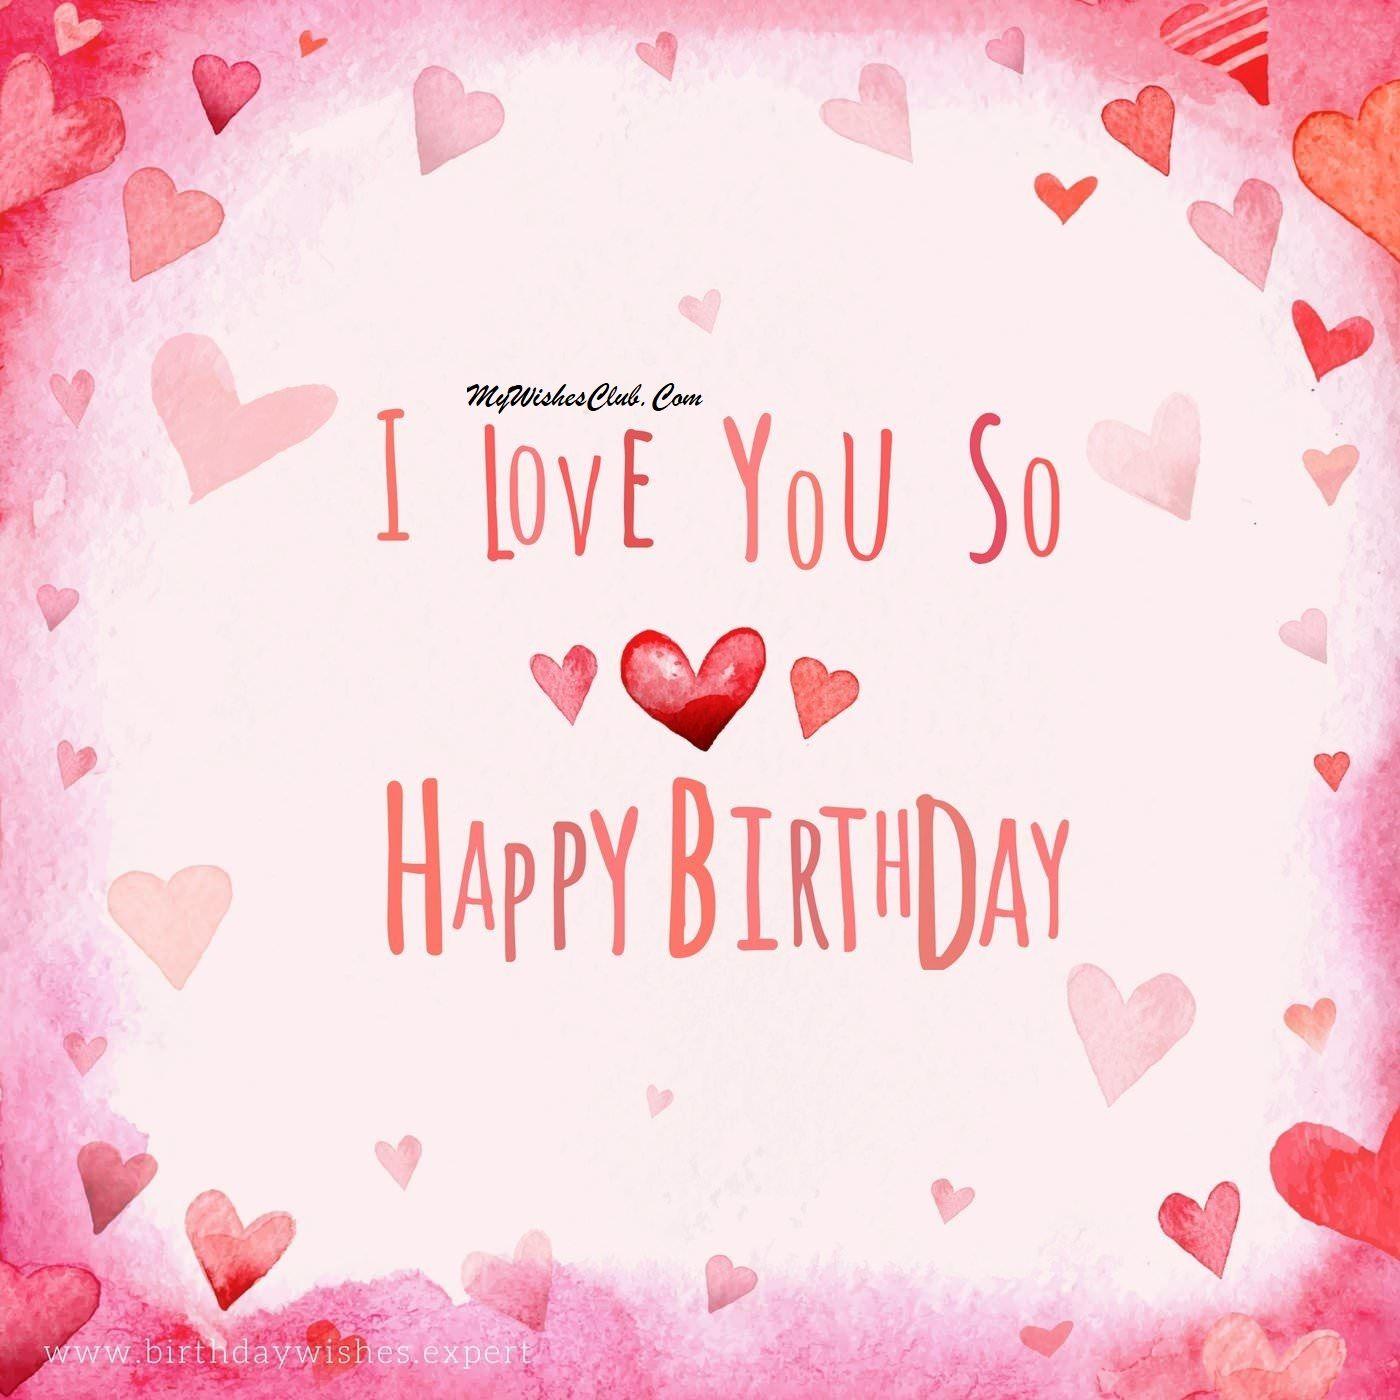 Happy Birthday Wishes For Wife _ Best Romantic Birthday